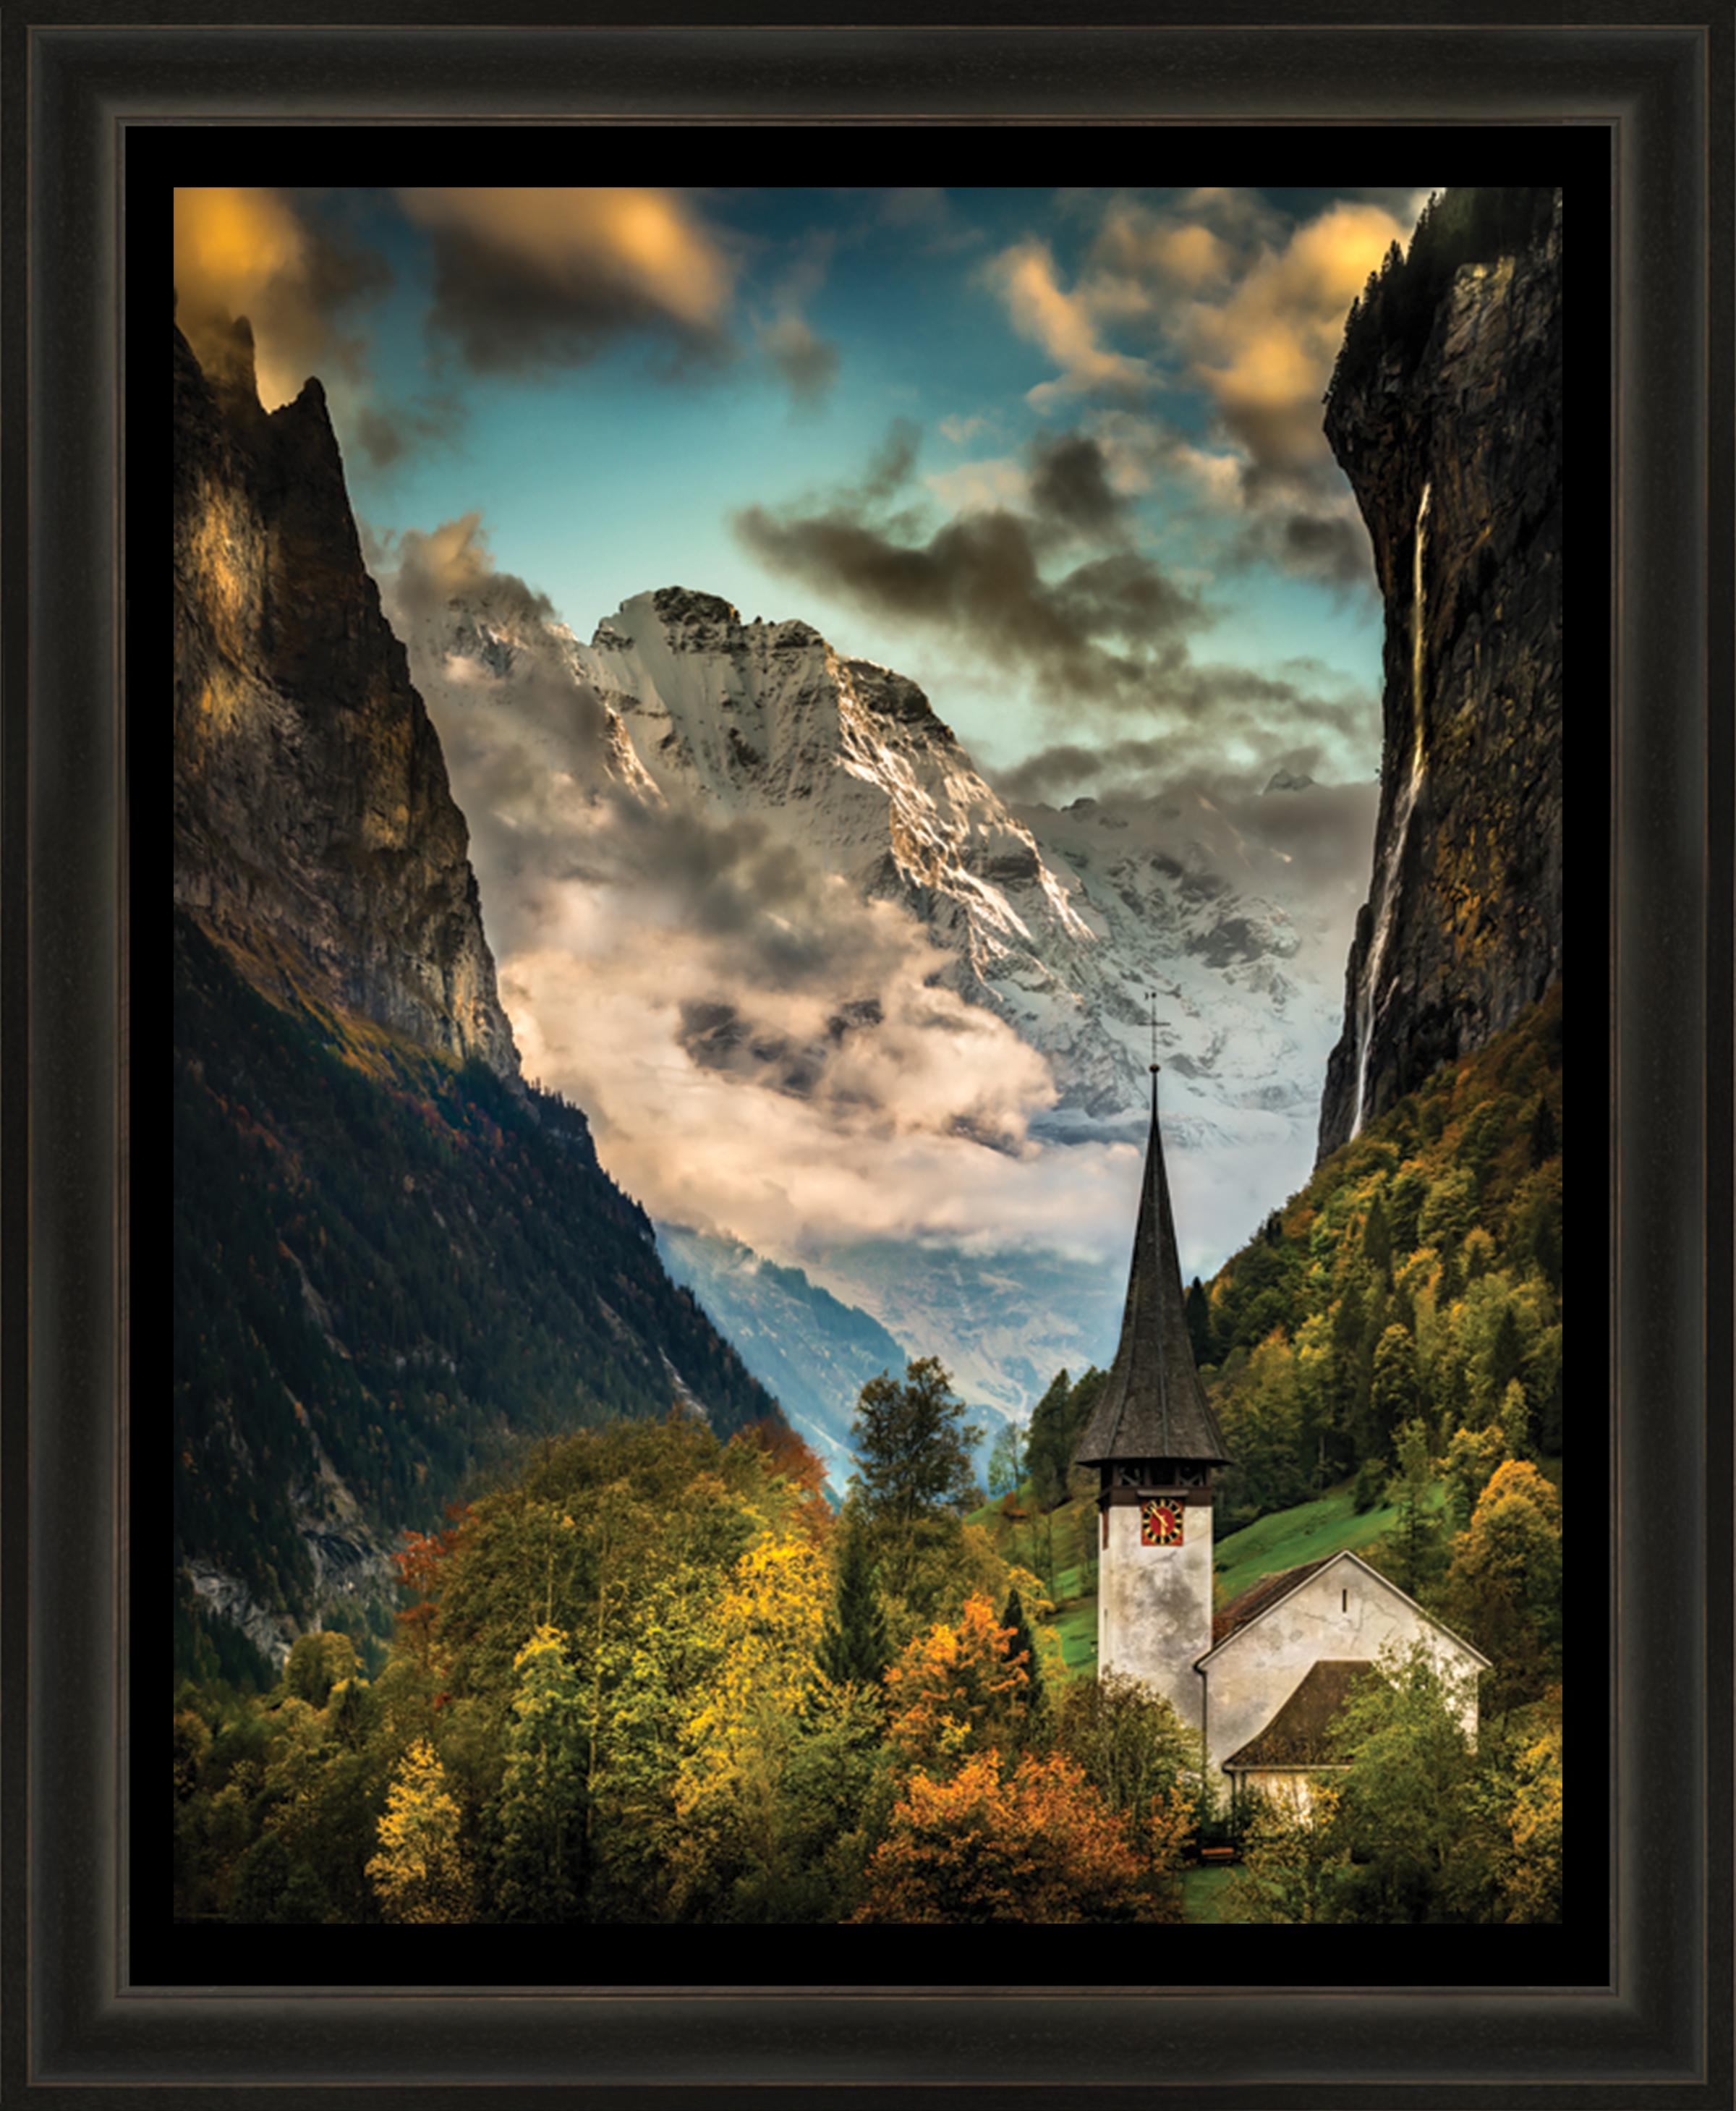 A-Lofty-View,-Switzerland-F.jpg